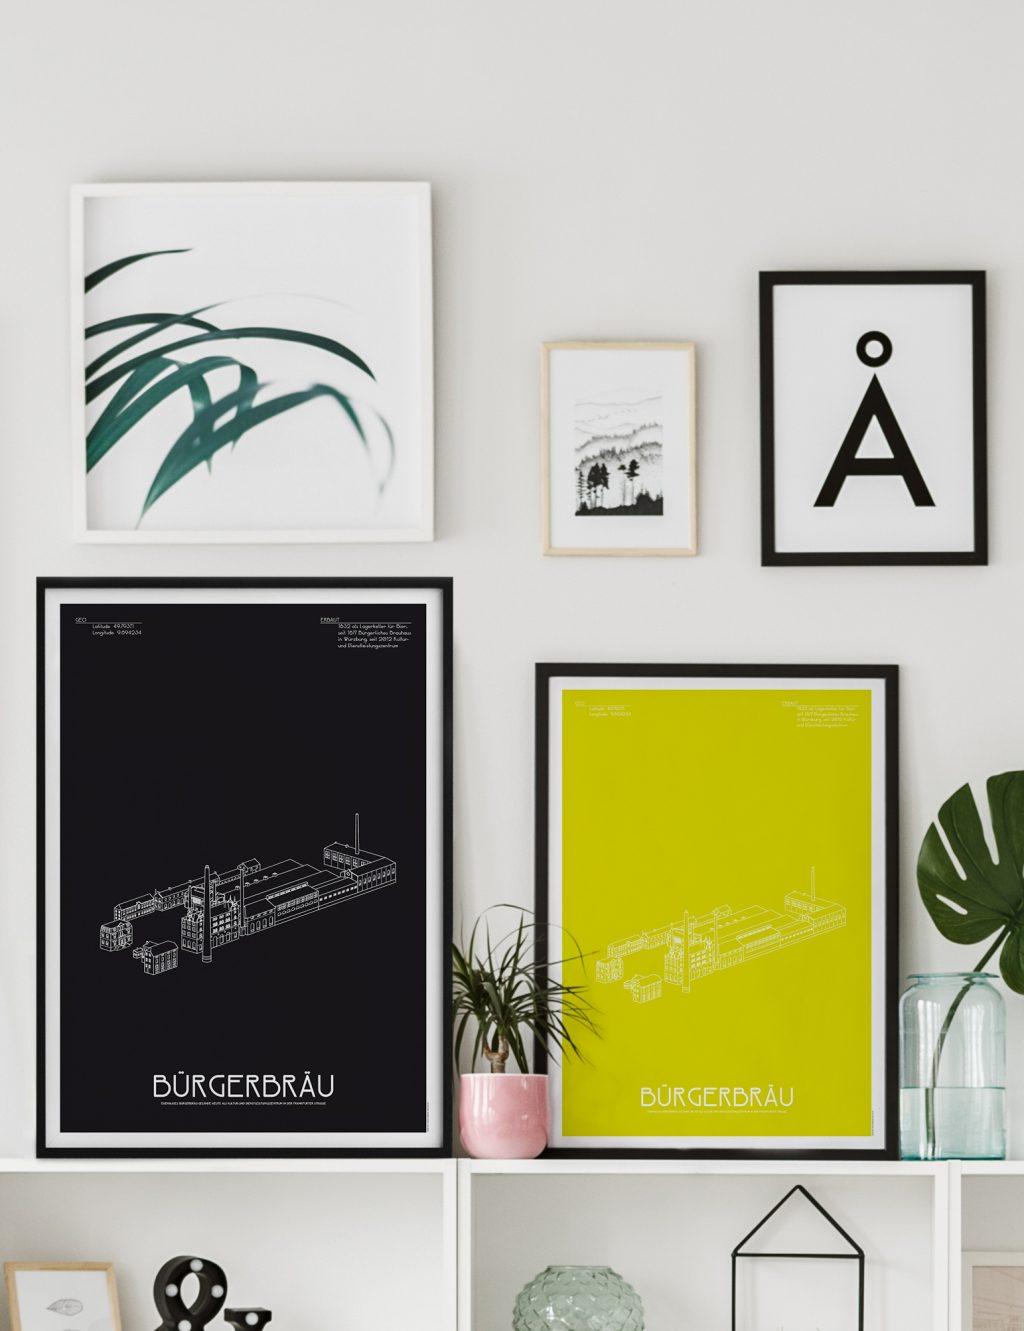 poster b rgerbr u w rzburg schwarz oder colored jo 39 s b ro f r gestaltung designb ro w rzburg. Black Bedroom Furniture Sets. Home Design Ideas